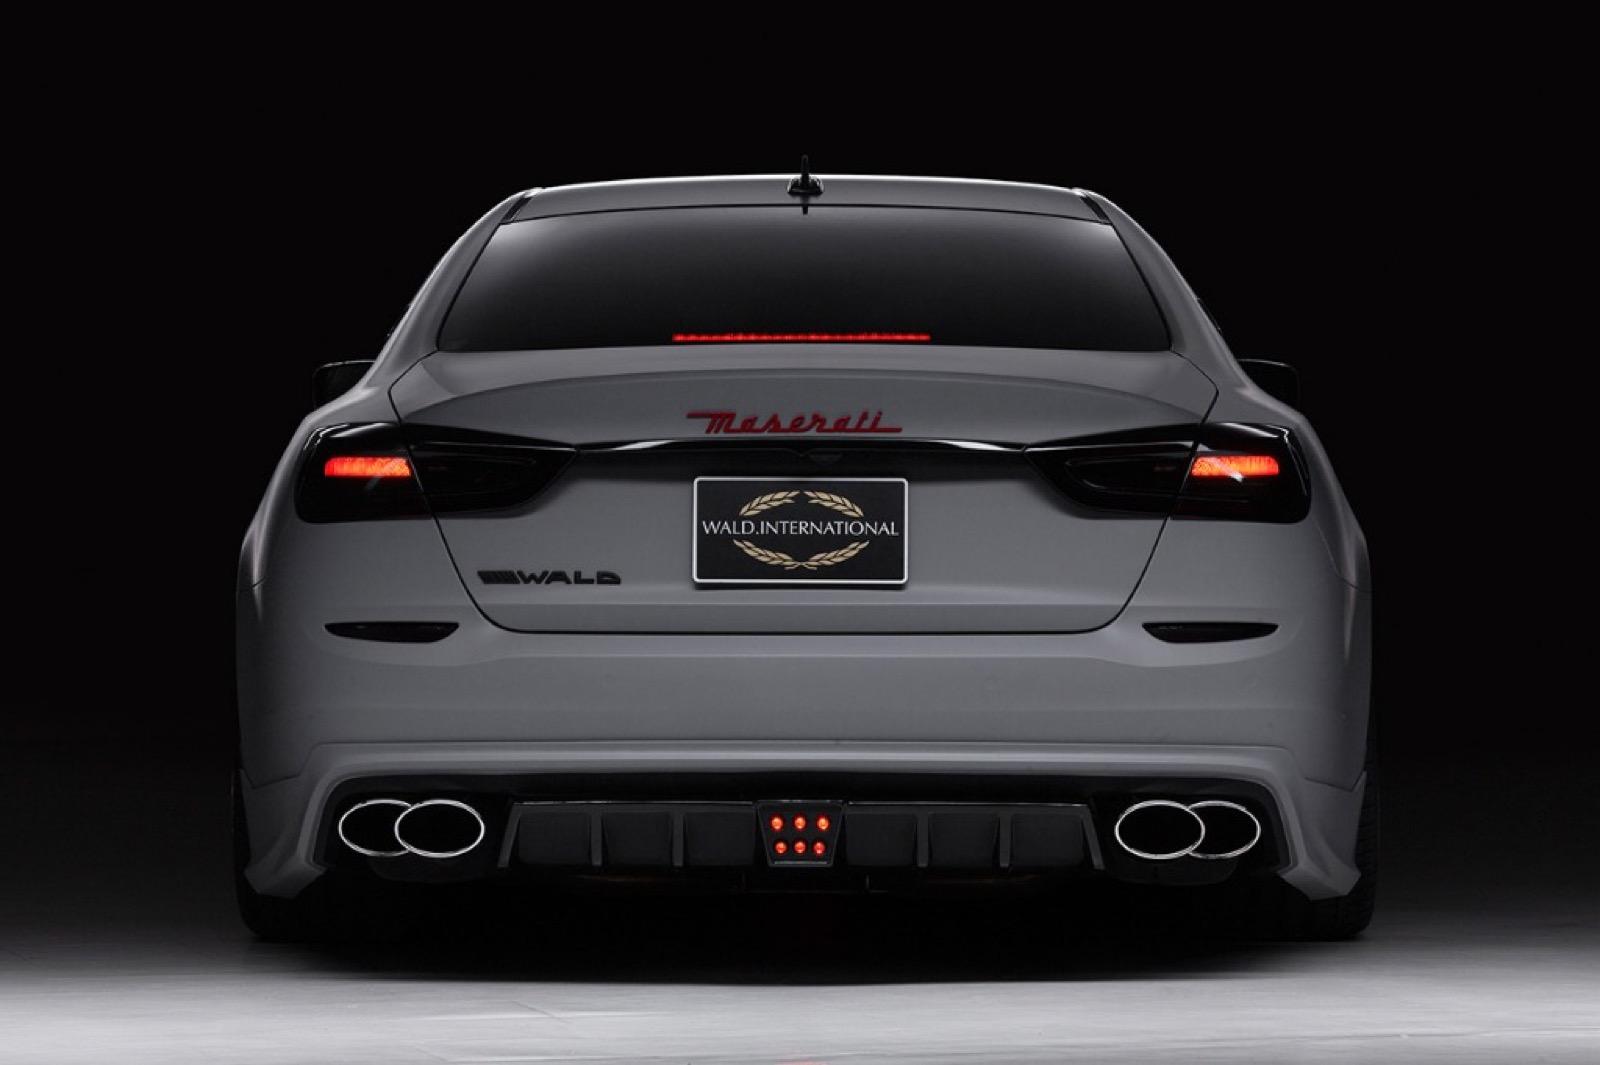 Maserati_Quattroporte_Wald_International_0003